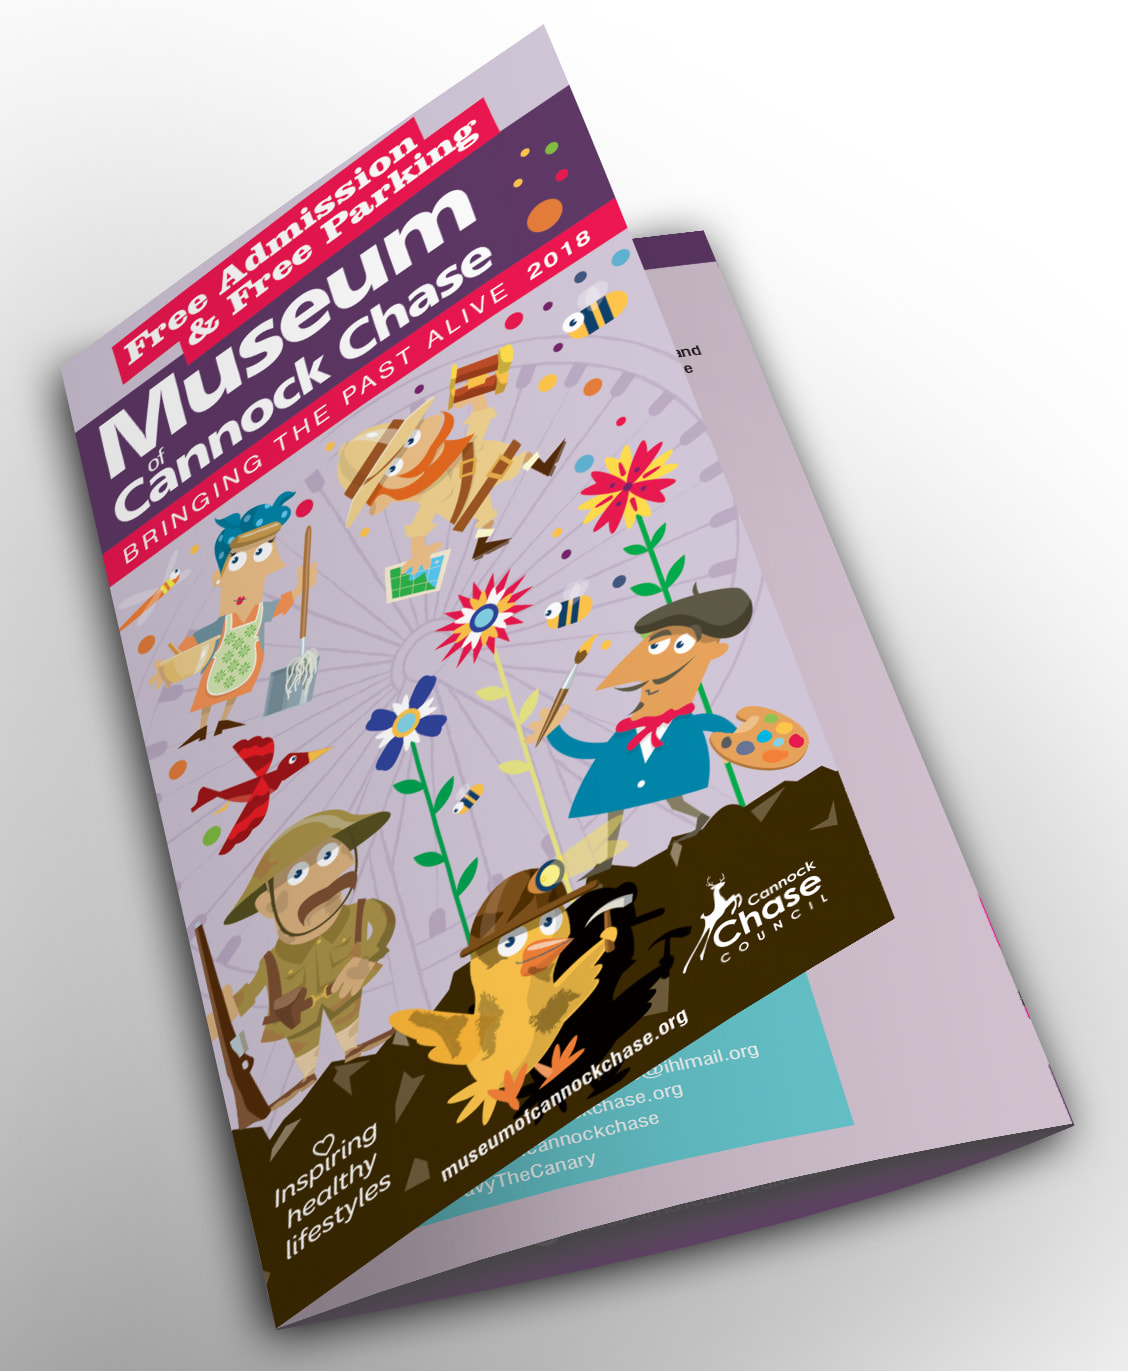 Inspiring Healthy Liftstyle - Design & Print